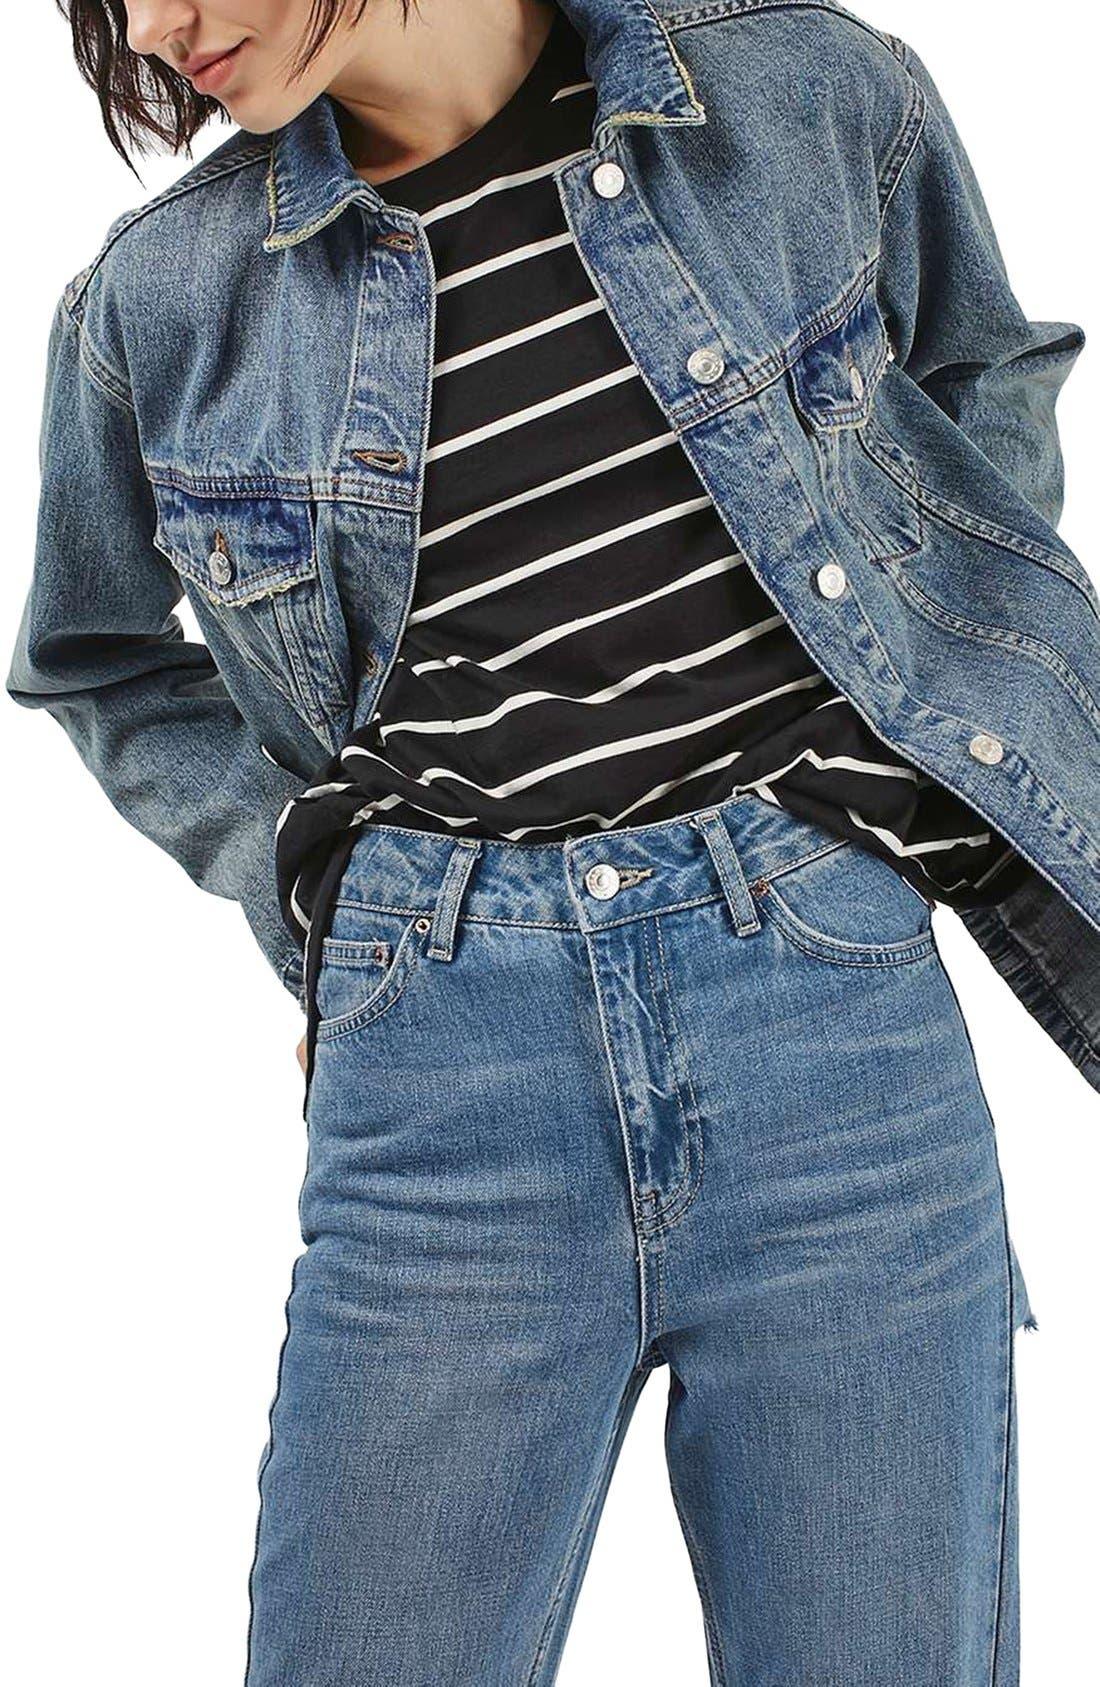 Alternate Image 1 Selected - Topshop Moto Dirty Lilac Oversized Denim Jacket